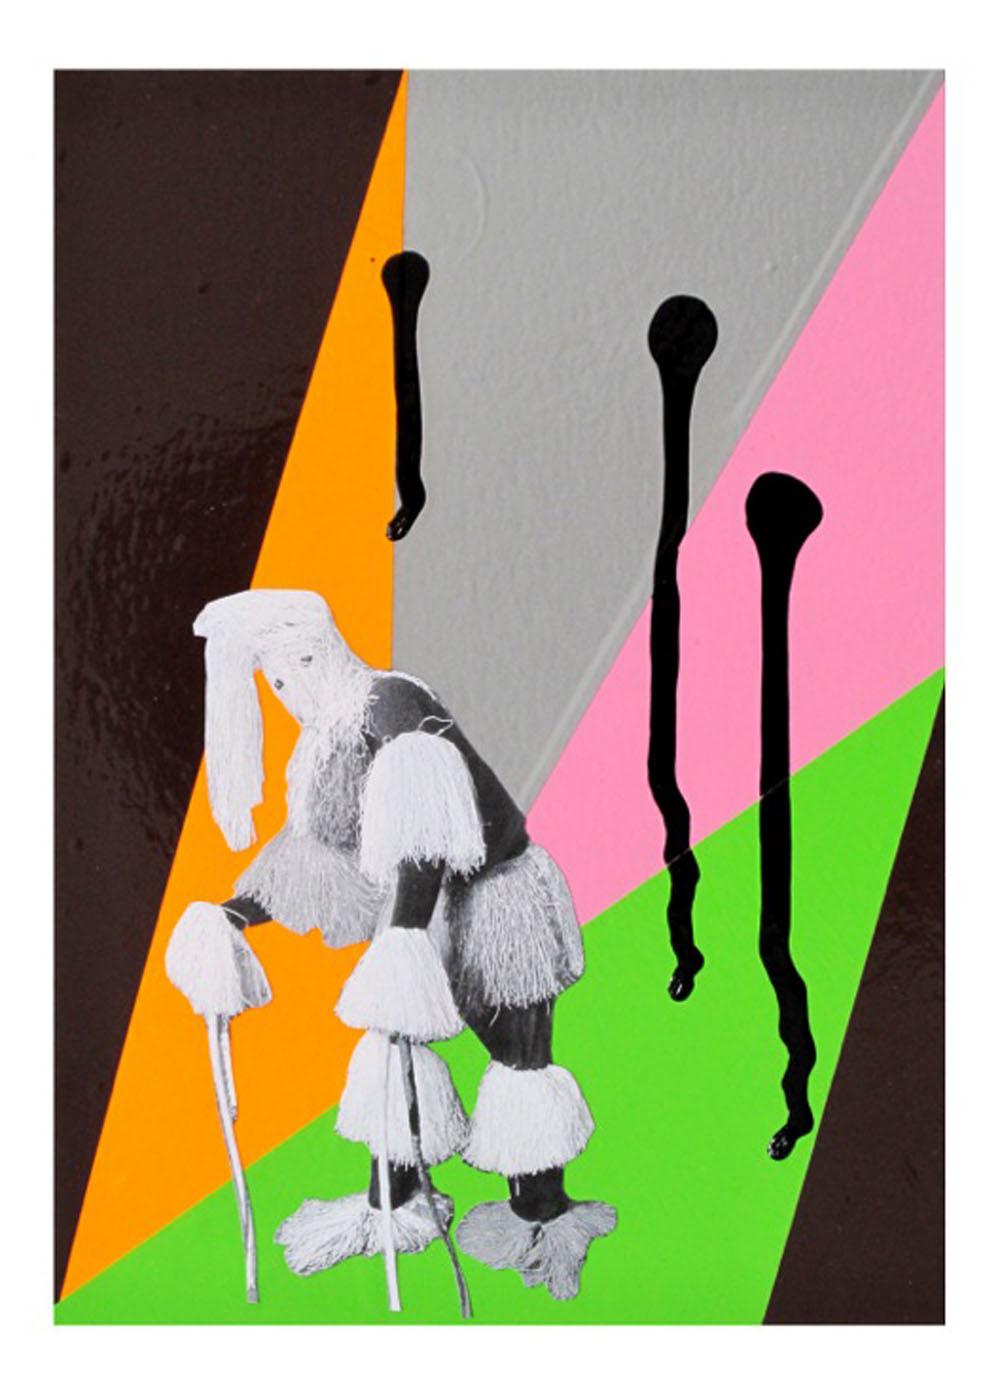 Costa Vece, Untitled, 2016 pvc foil, inkjet print, black gloss paint, cardboard, 38 cm x 31 cm